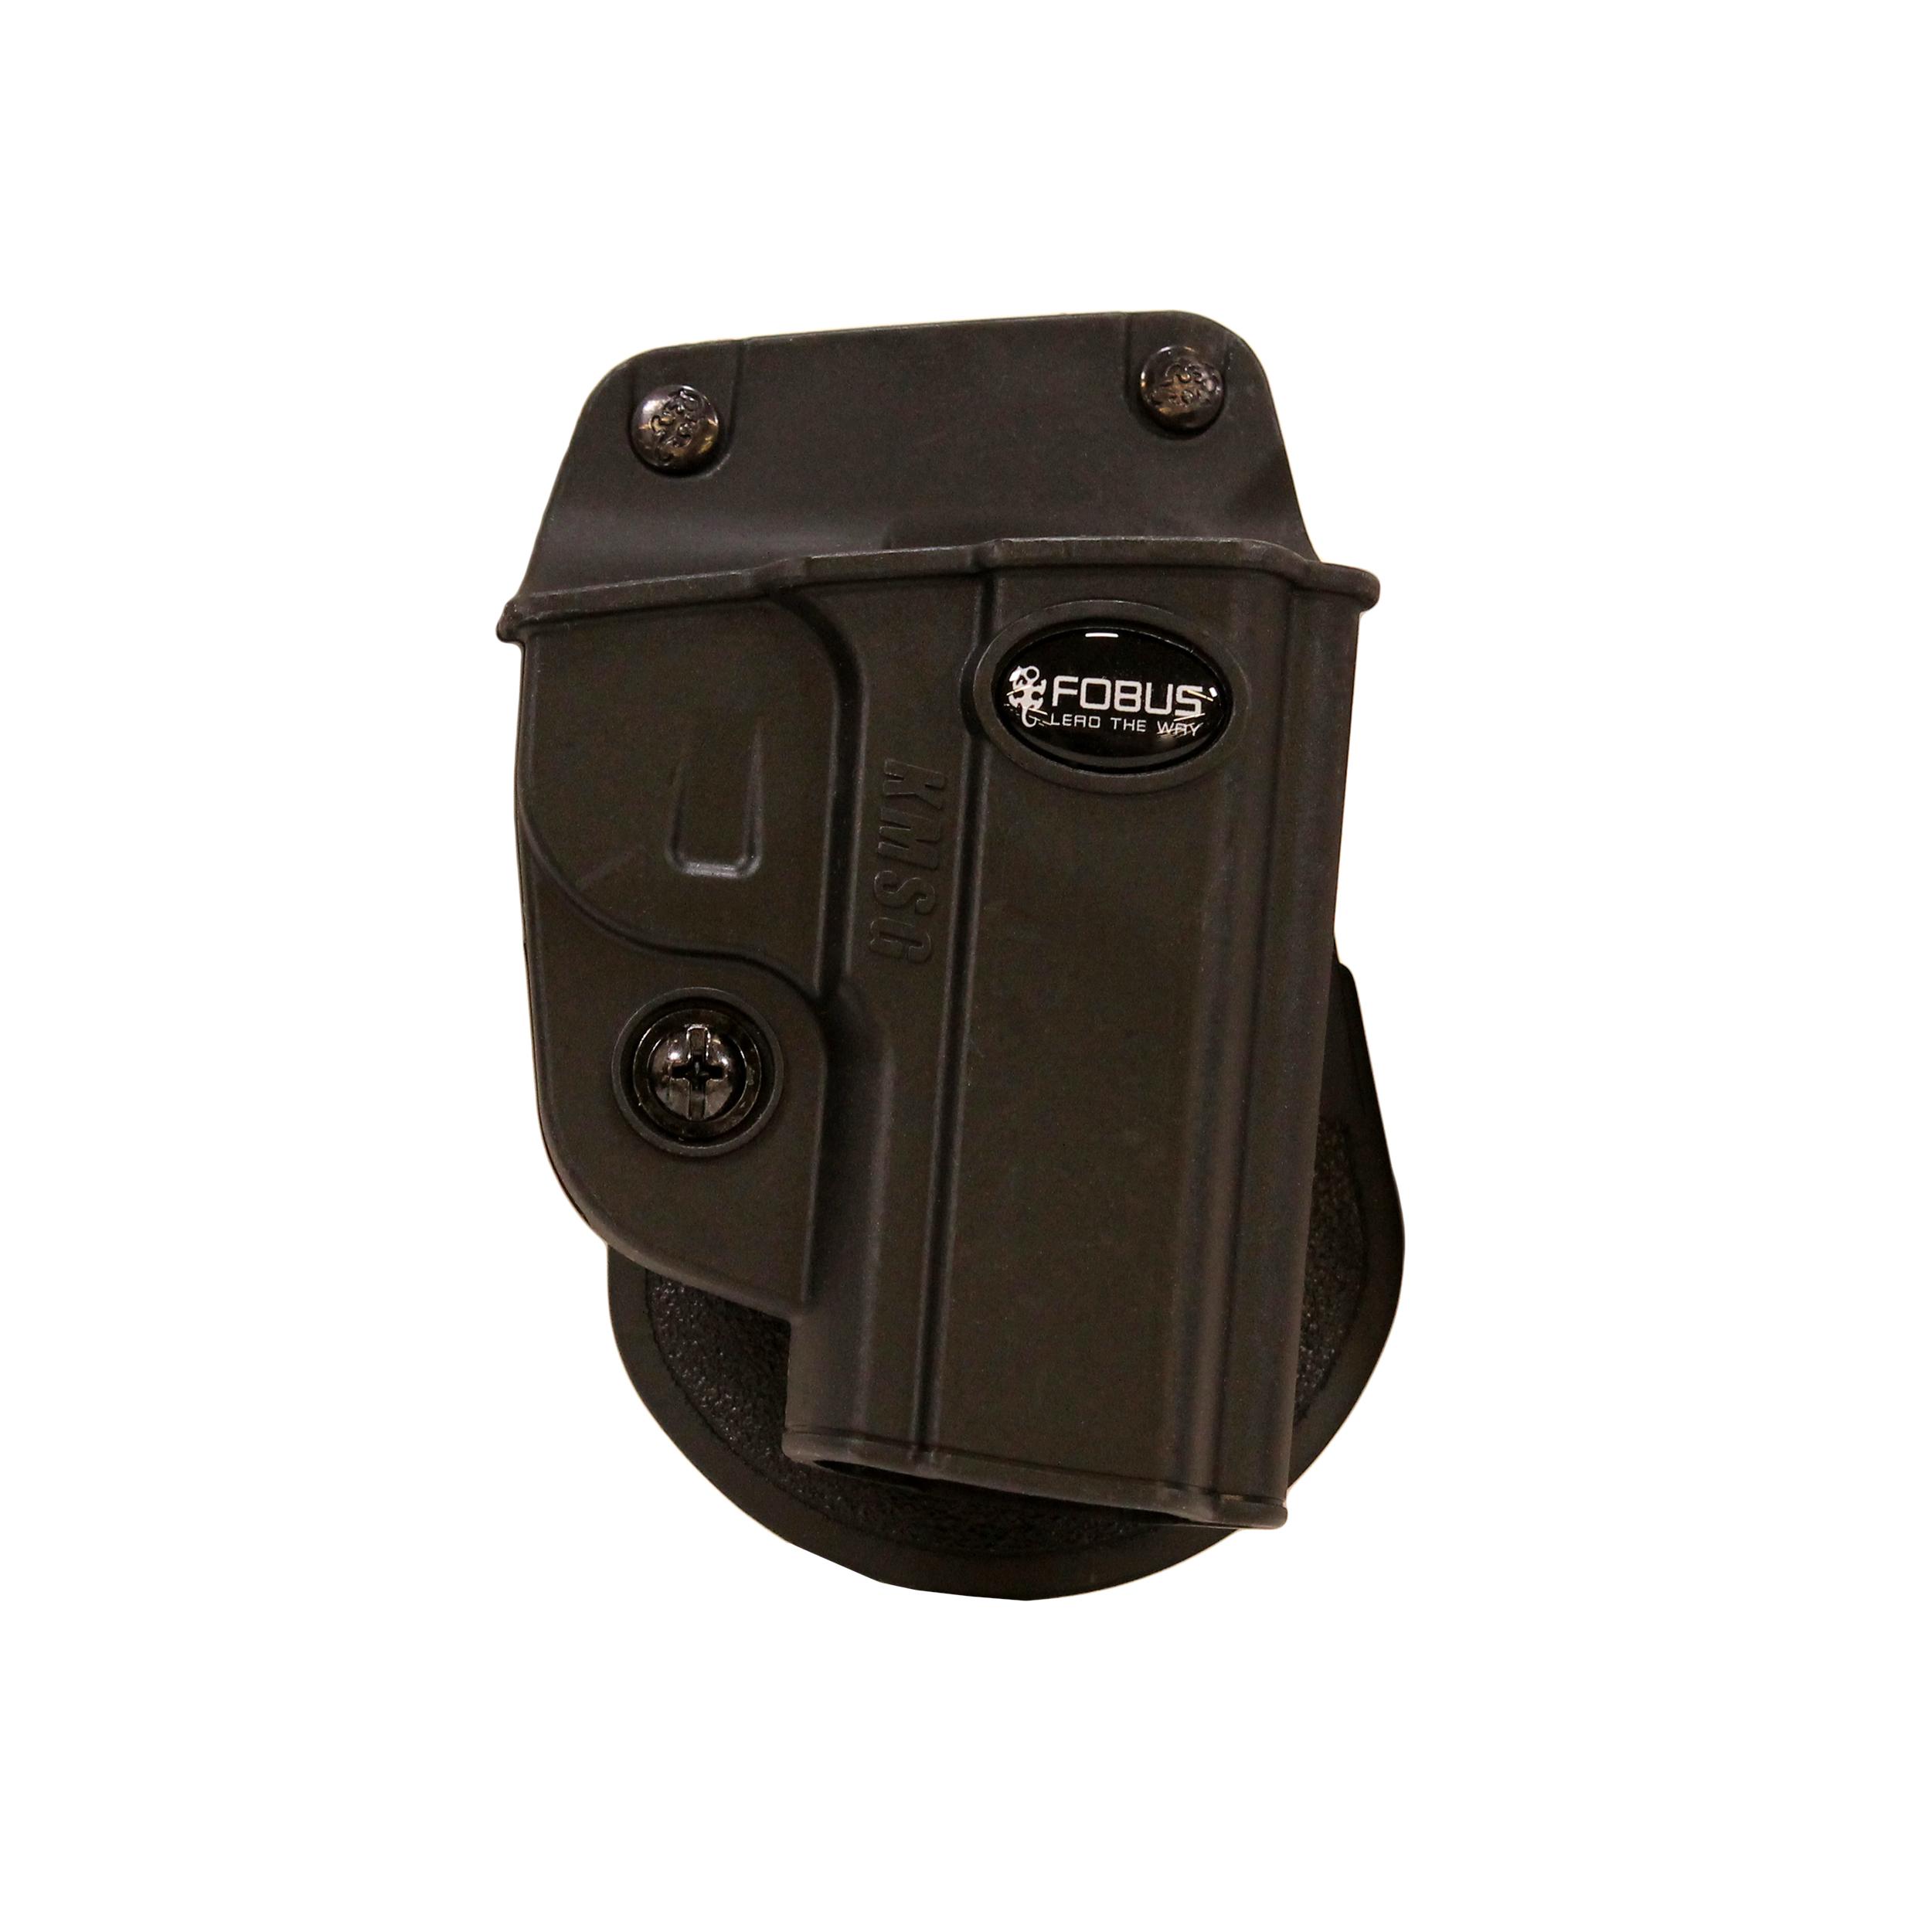 Fobus KMSG Evolution Paddle Holster Right Hand Black Holsters, Belts